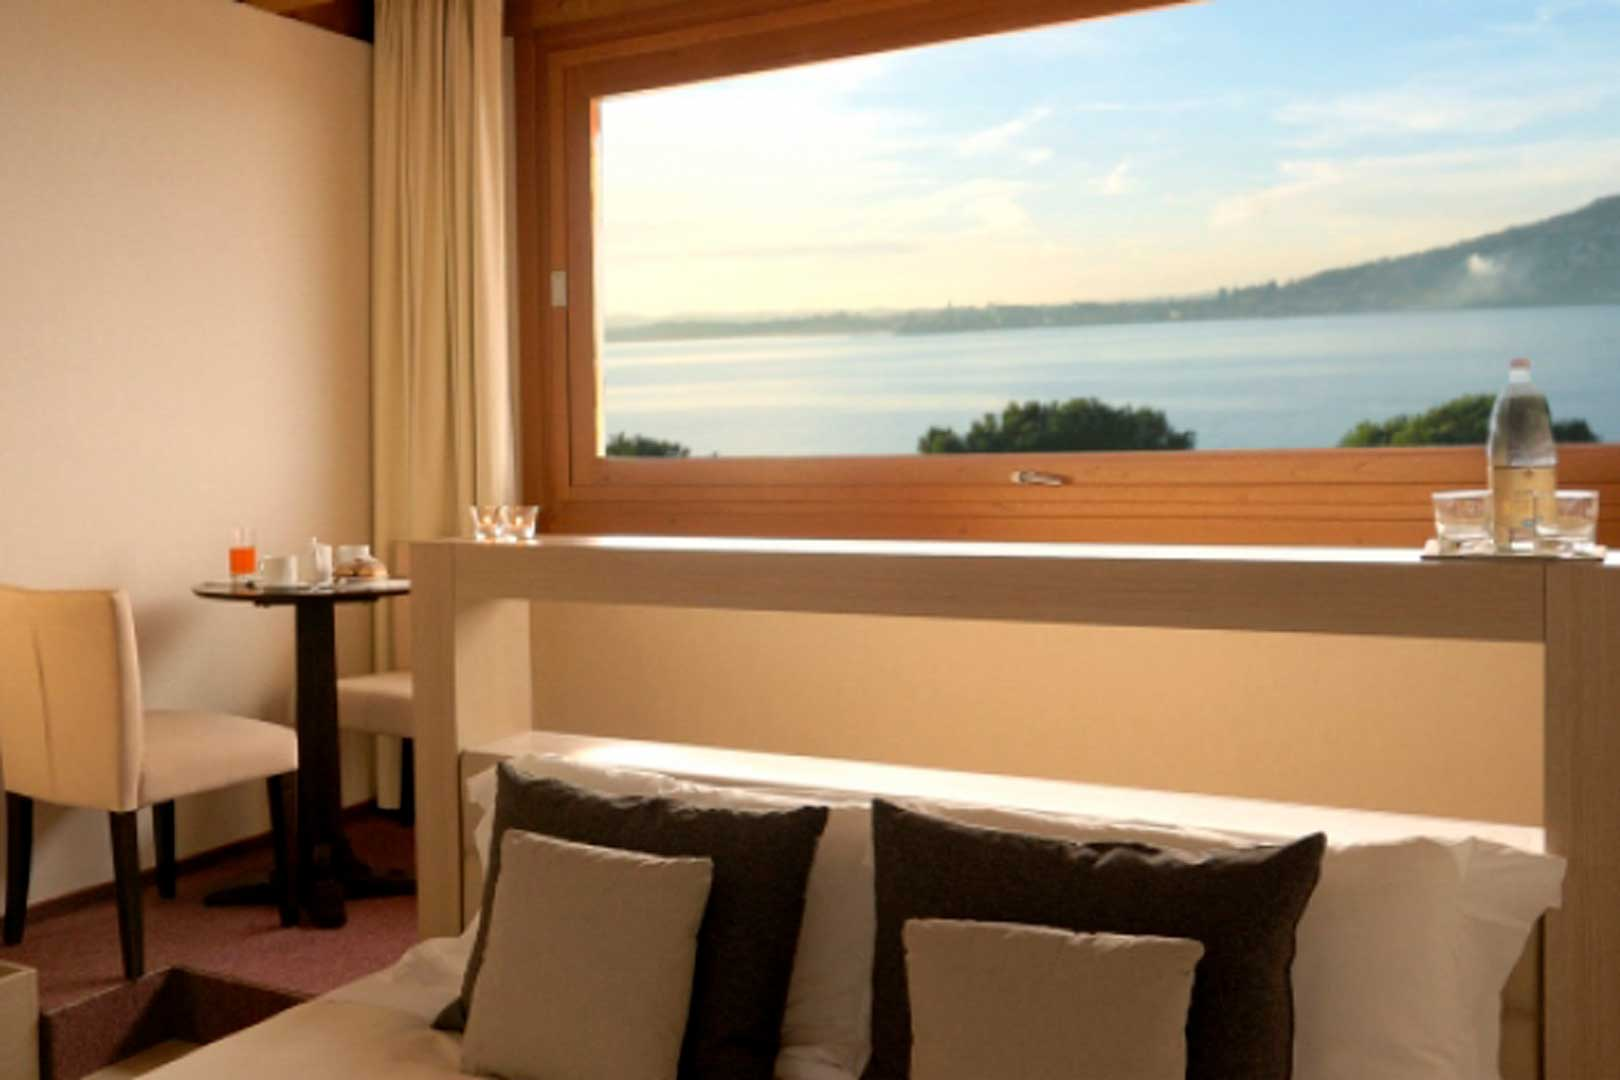 15-hotel-con-spa-per-un-weekend-romantico-vicino-milano-cocca-hotel-royal-thai-spa-ok